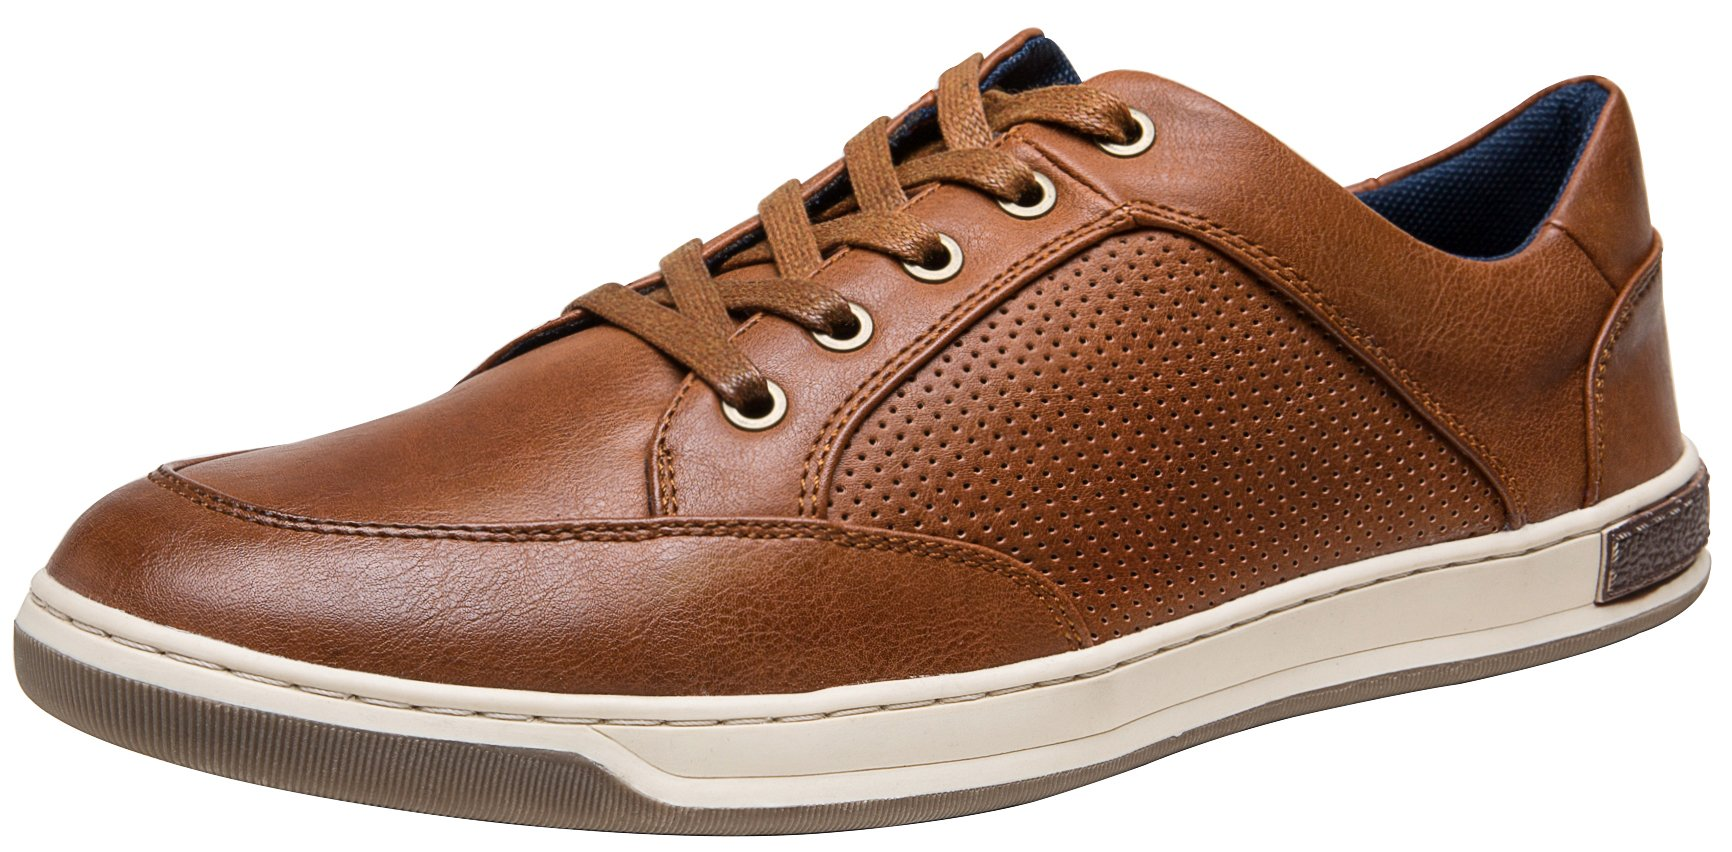 JOUSEN Men's Fashion Sneakers Lightweight Casual Shoes Business Dress Sneaker (10.5,Brown)